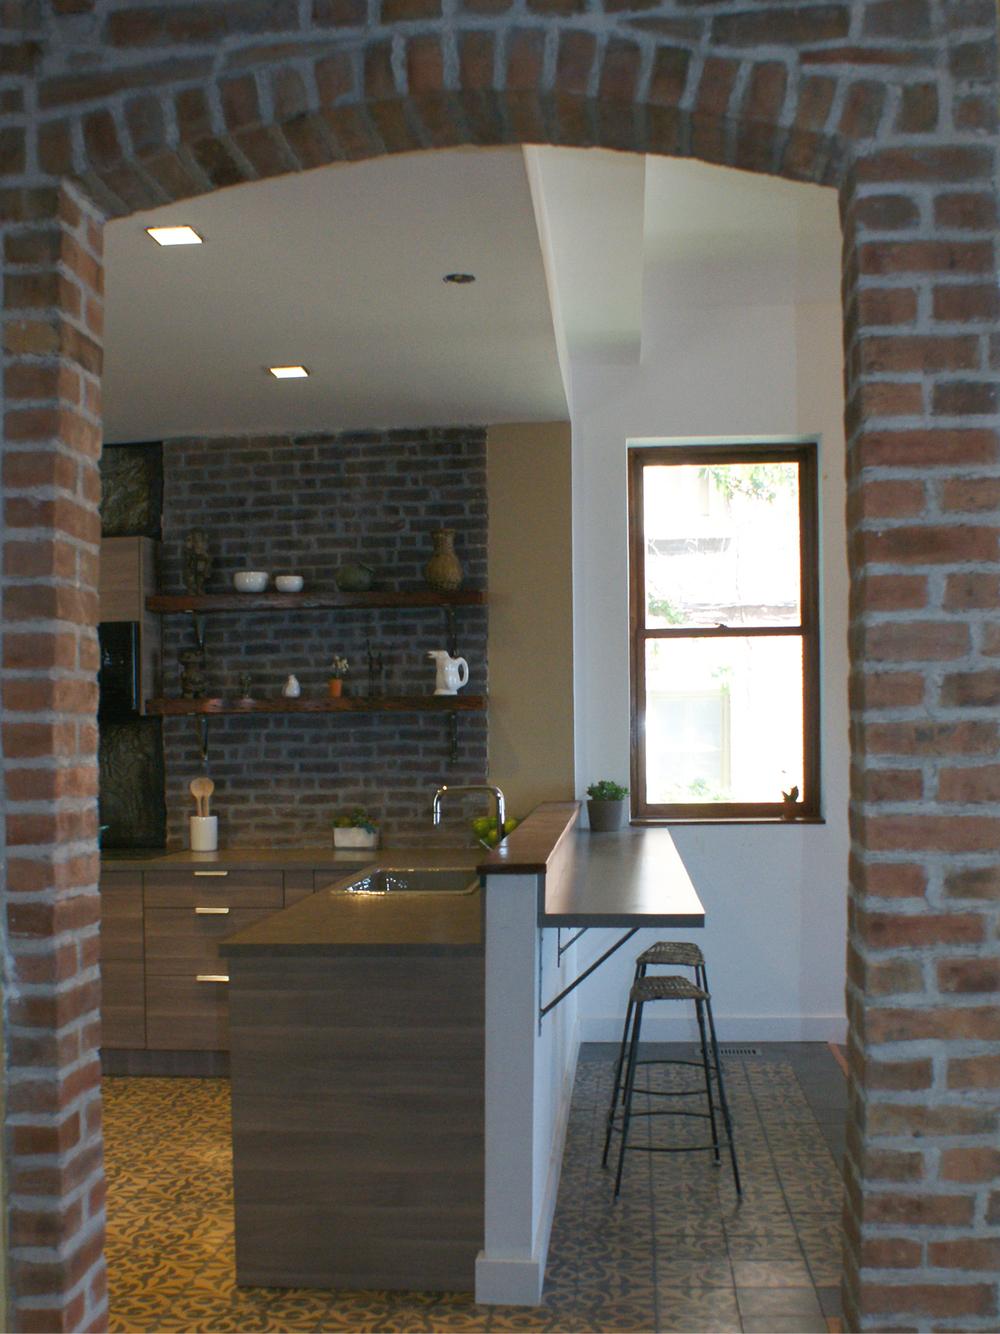 CasaHudson_kitchen2_2.jpg